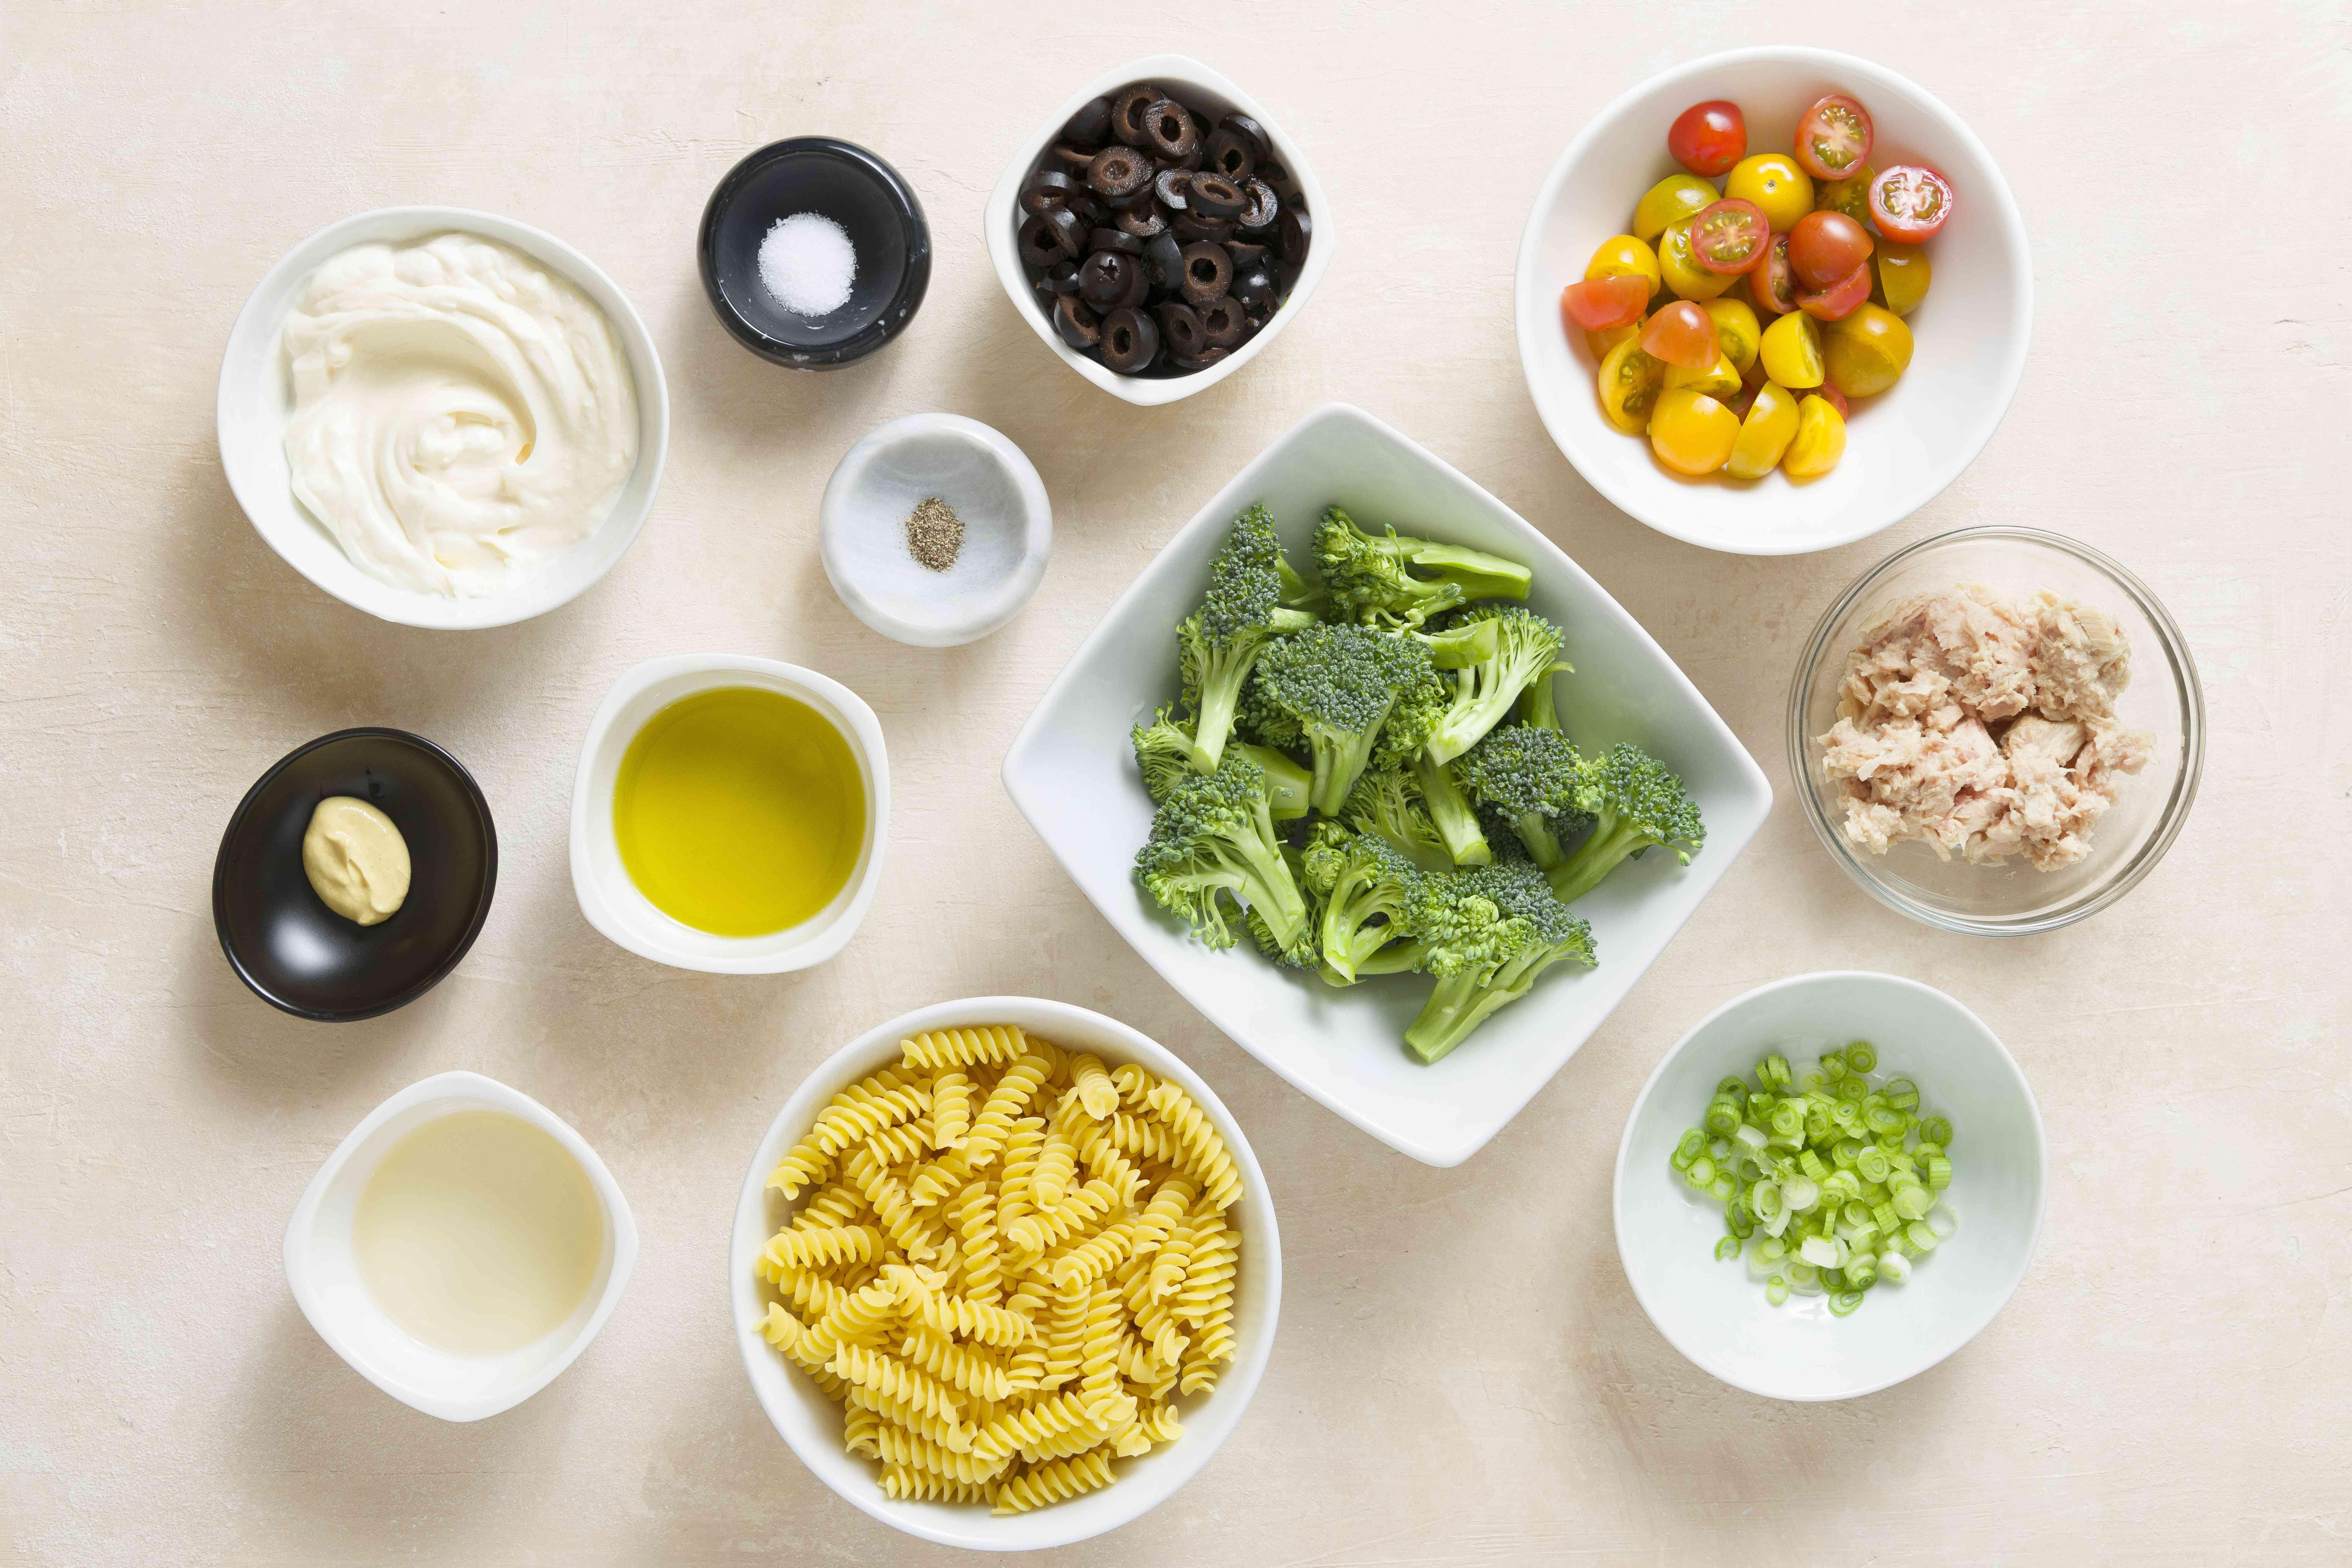 Tuna and Veggie Pasta Salad (Parve) ingredients